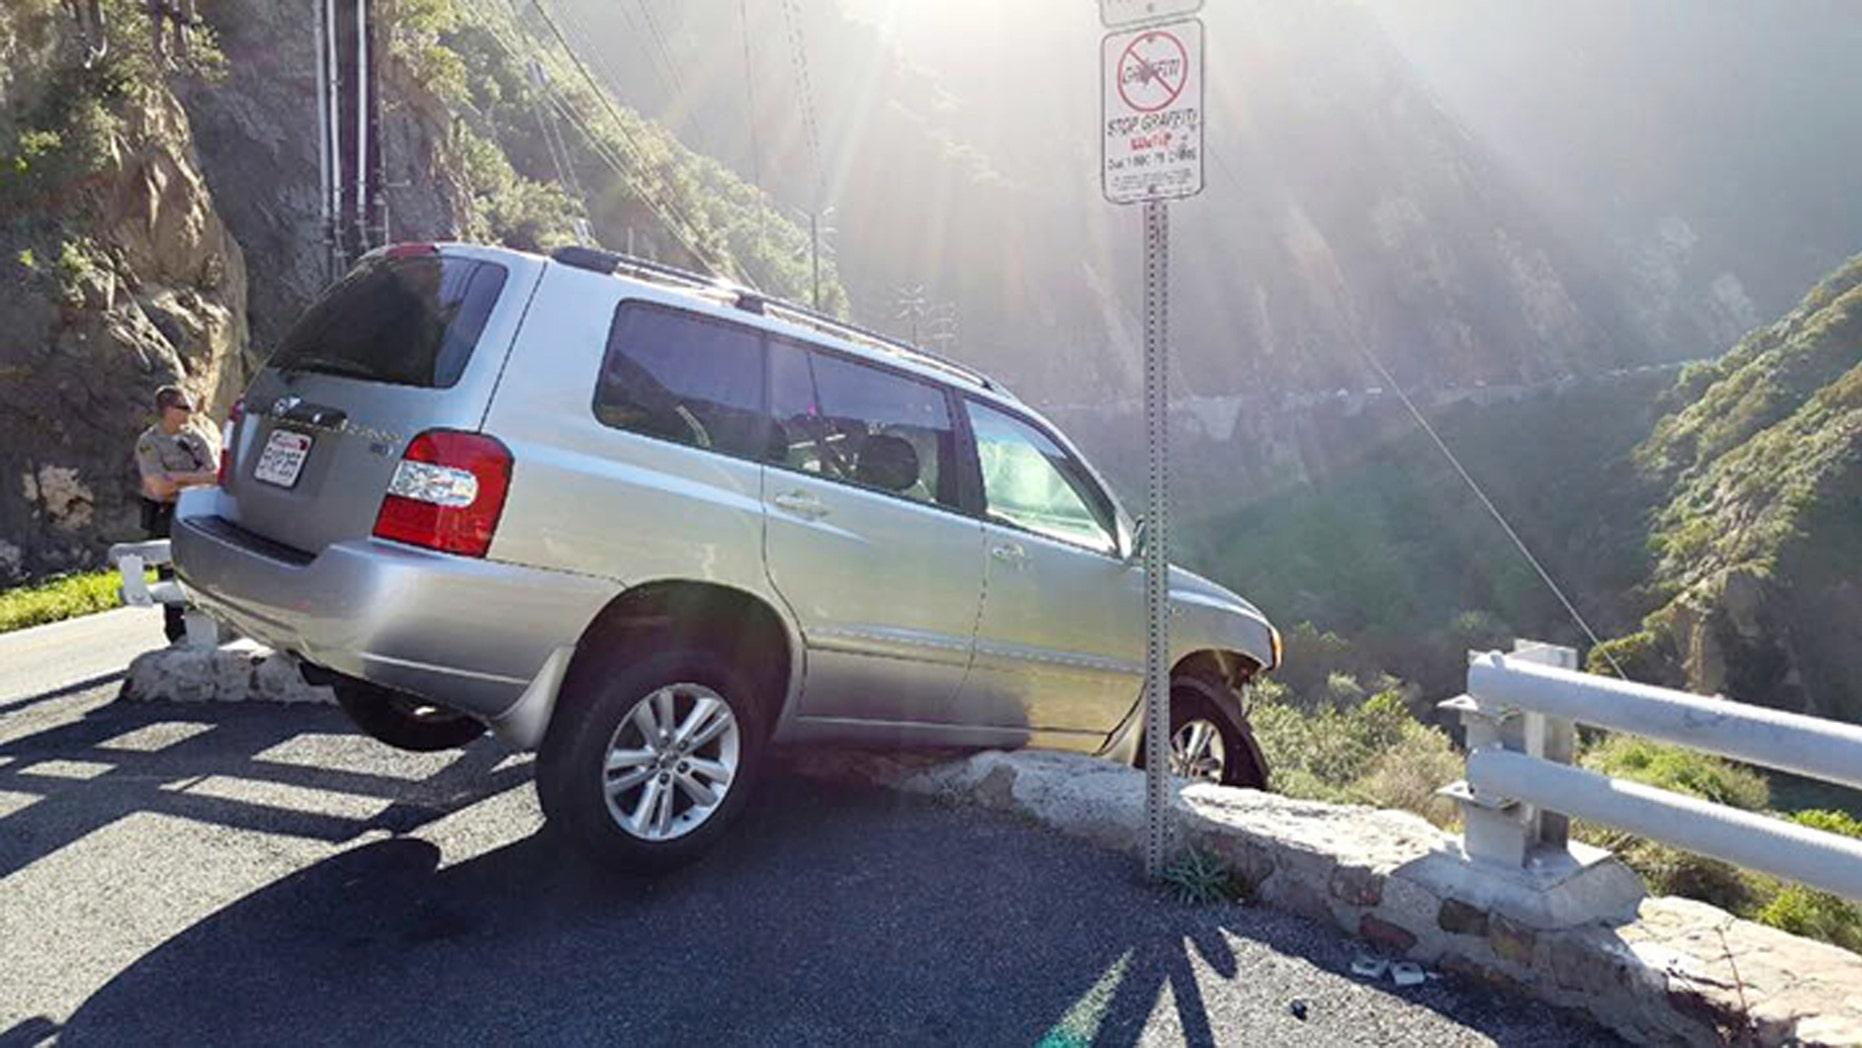 An SUV that broke through a guardrail in Malibu.